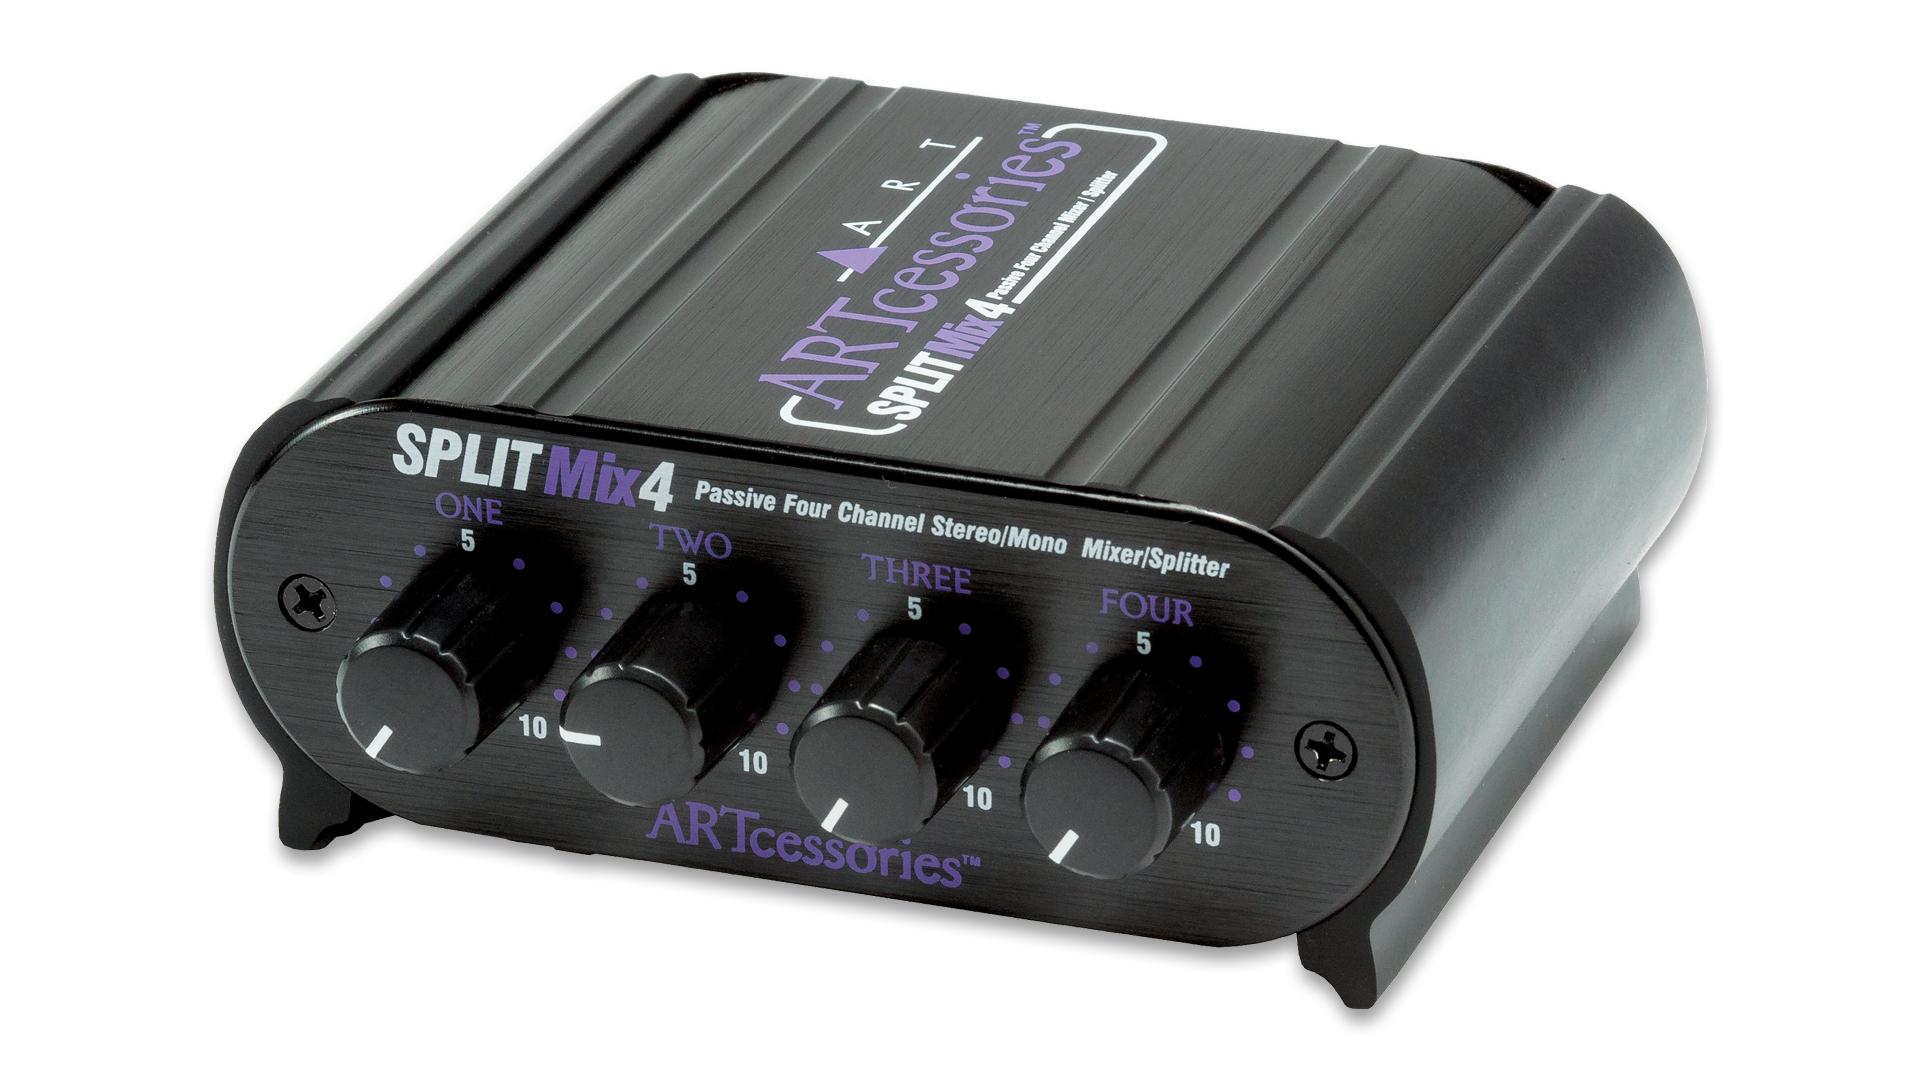 Passive Headphone Splitter With Volume Control Per Headphone